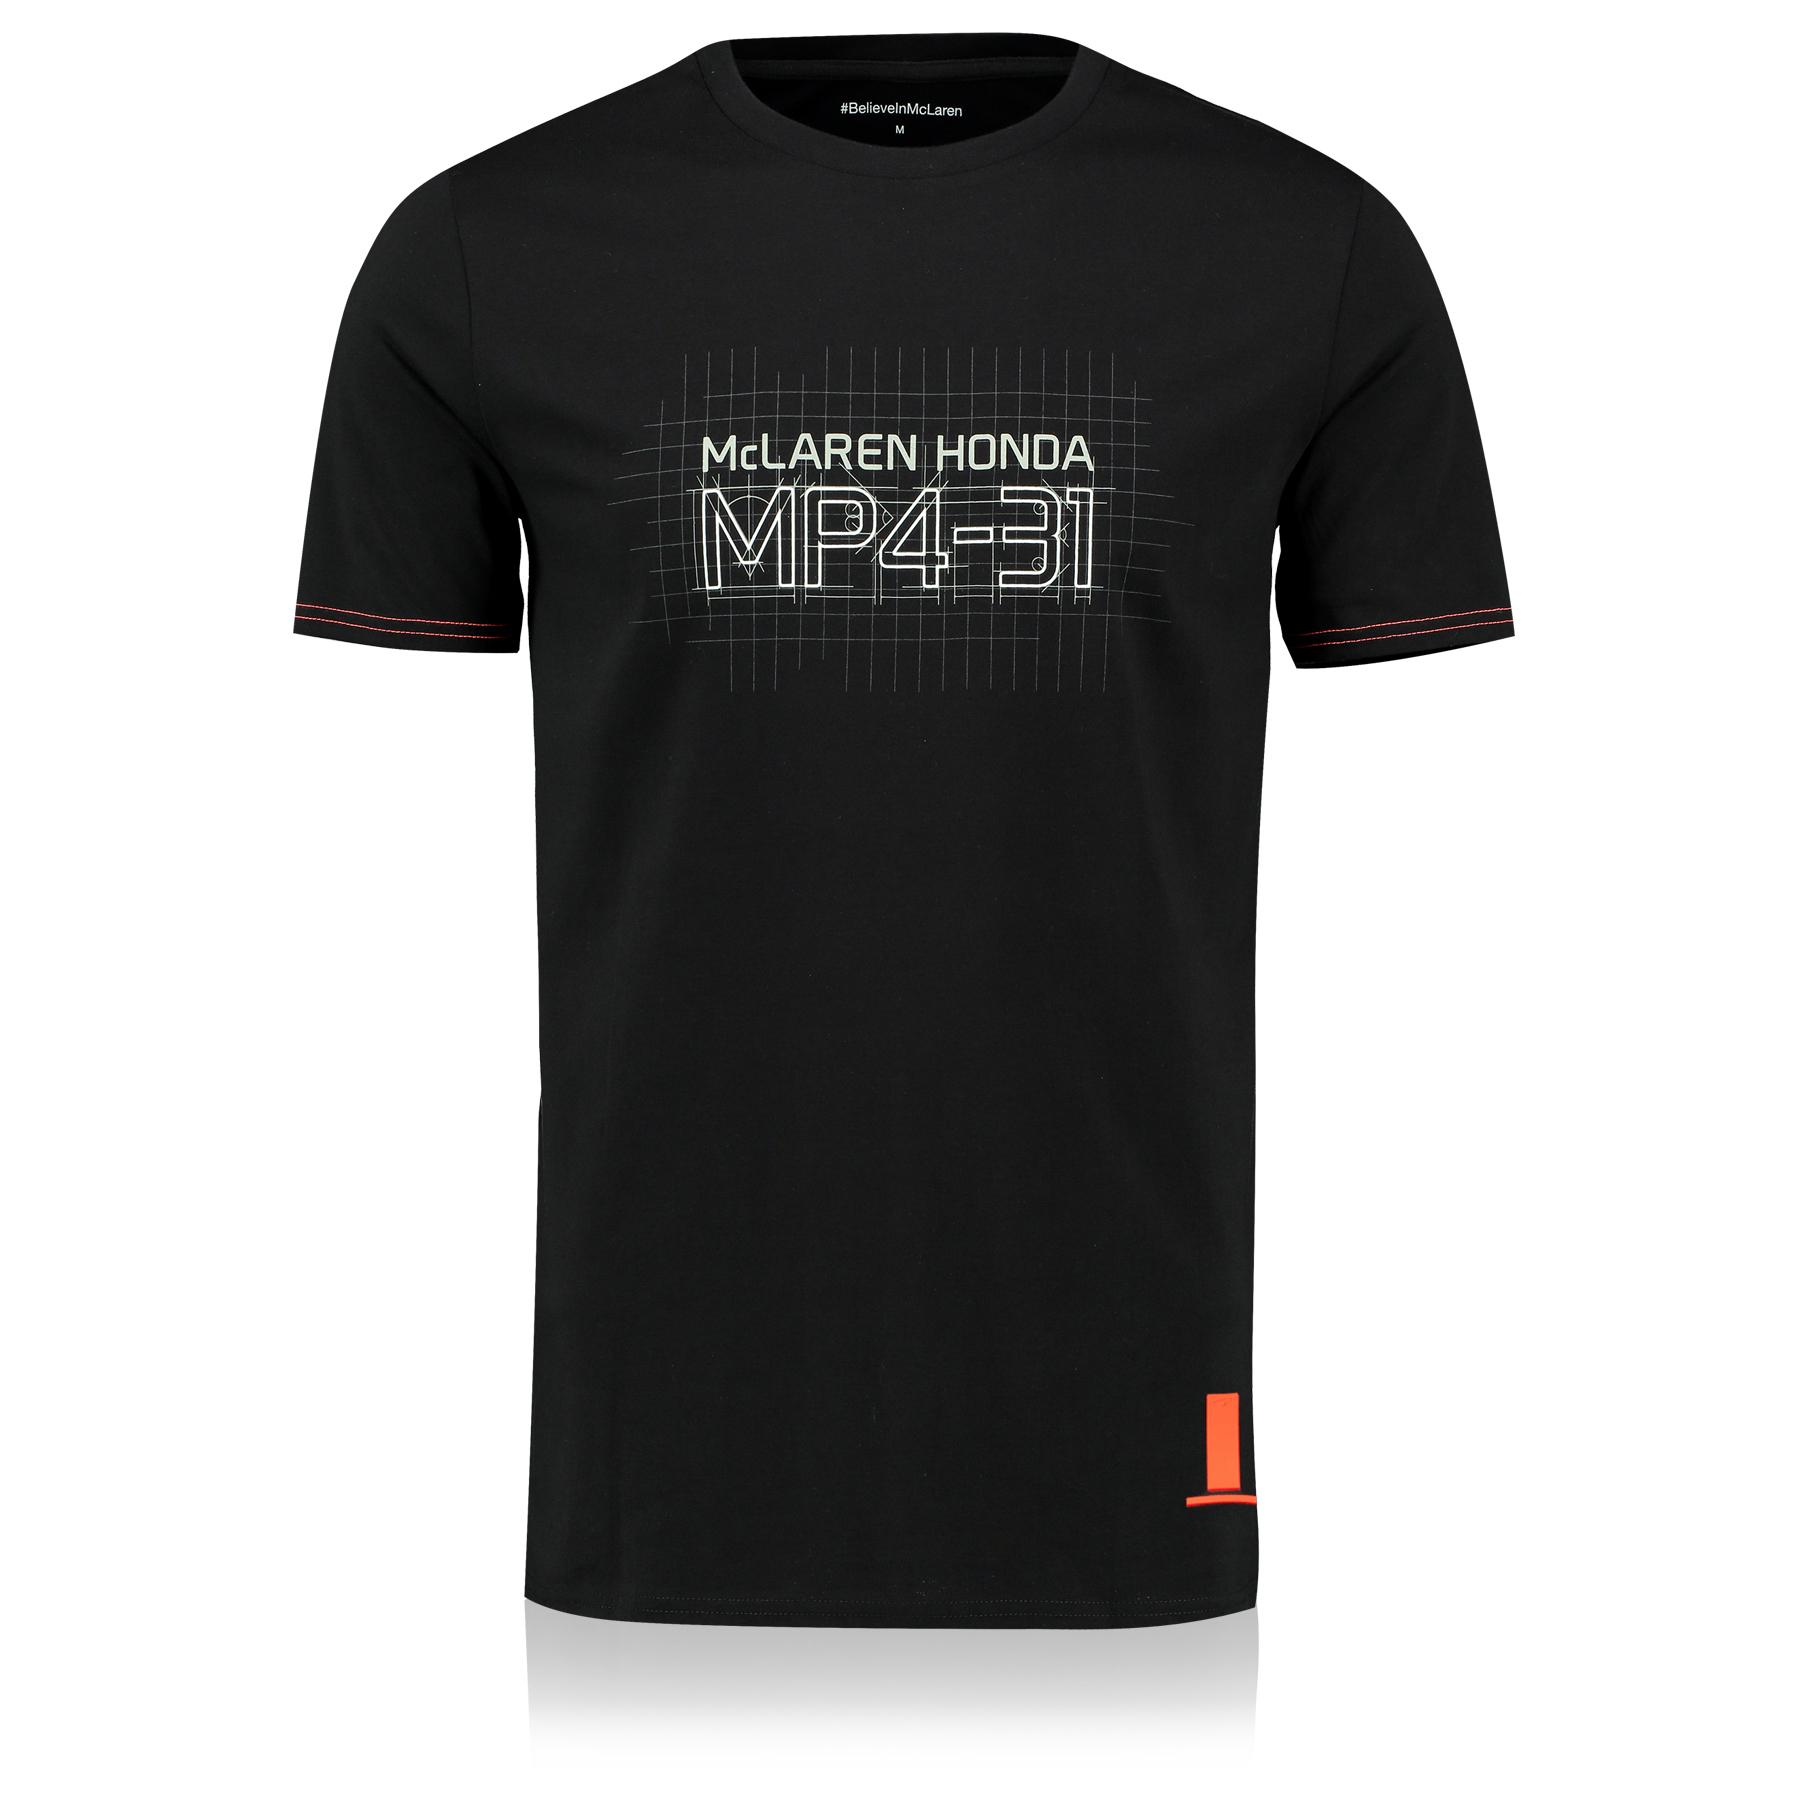 McLaren Honda Essentials MP4-31 T-Shirt - Black